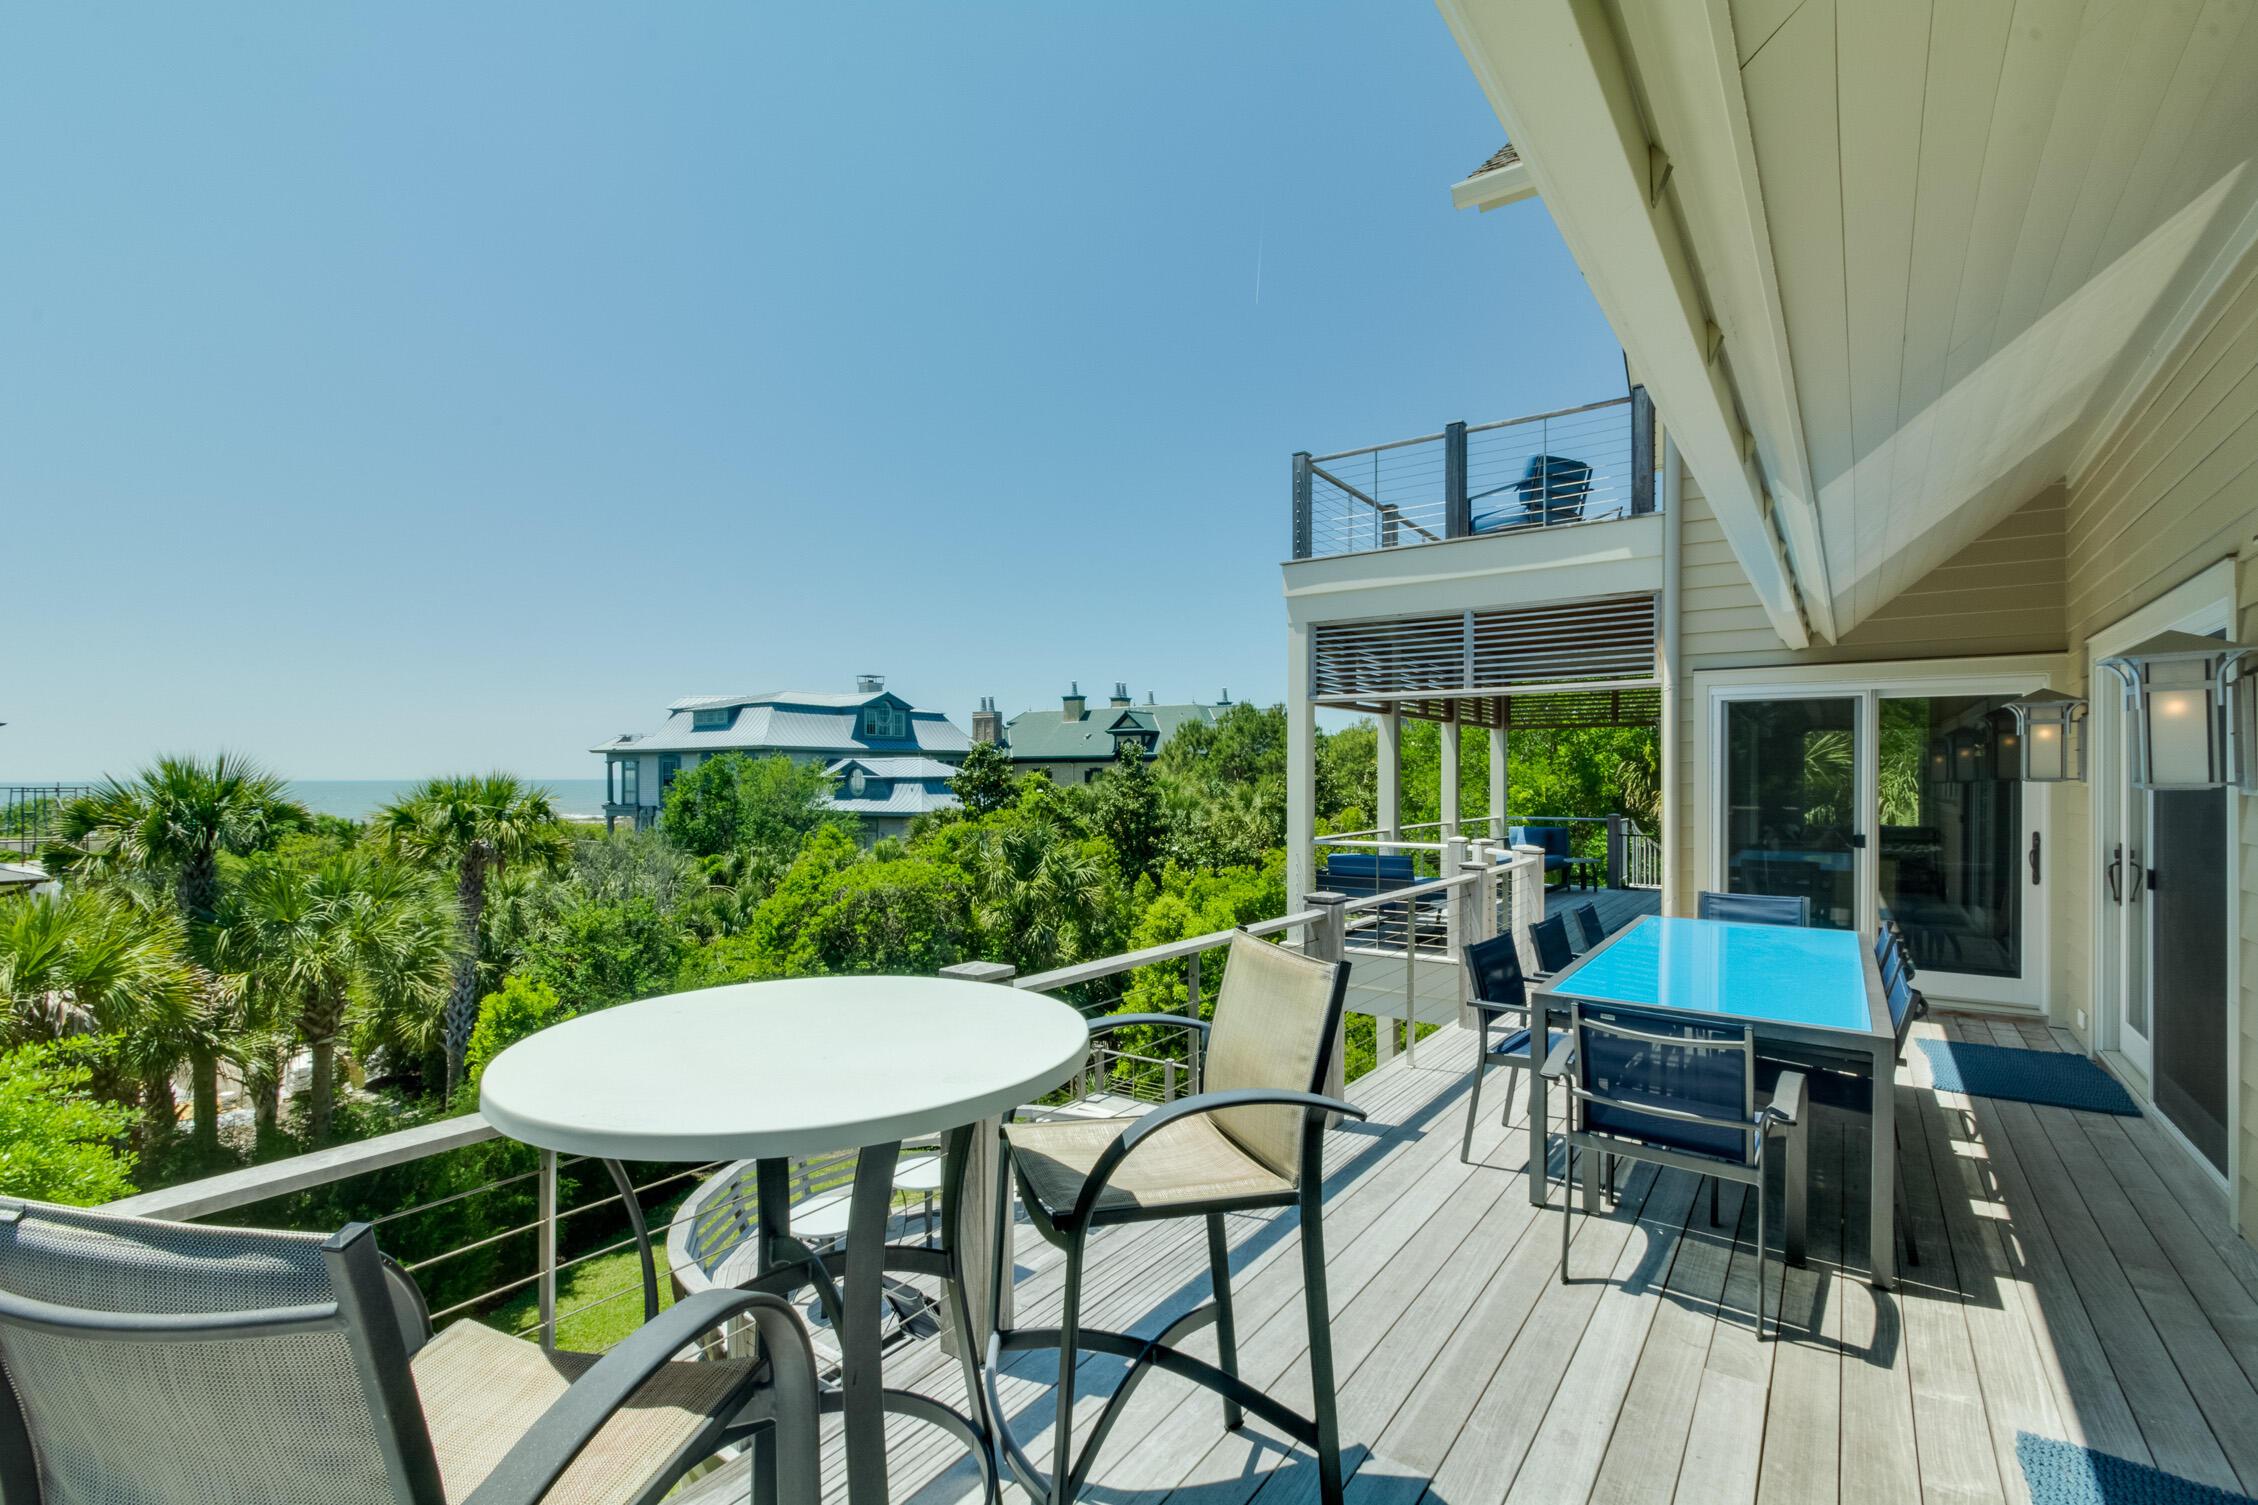 Kiawah Island Homes For Sale - 44 Surfsong Road, Kiawah Island, SC - 7